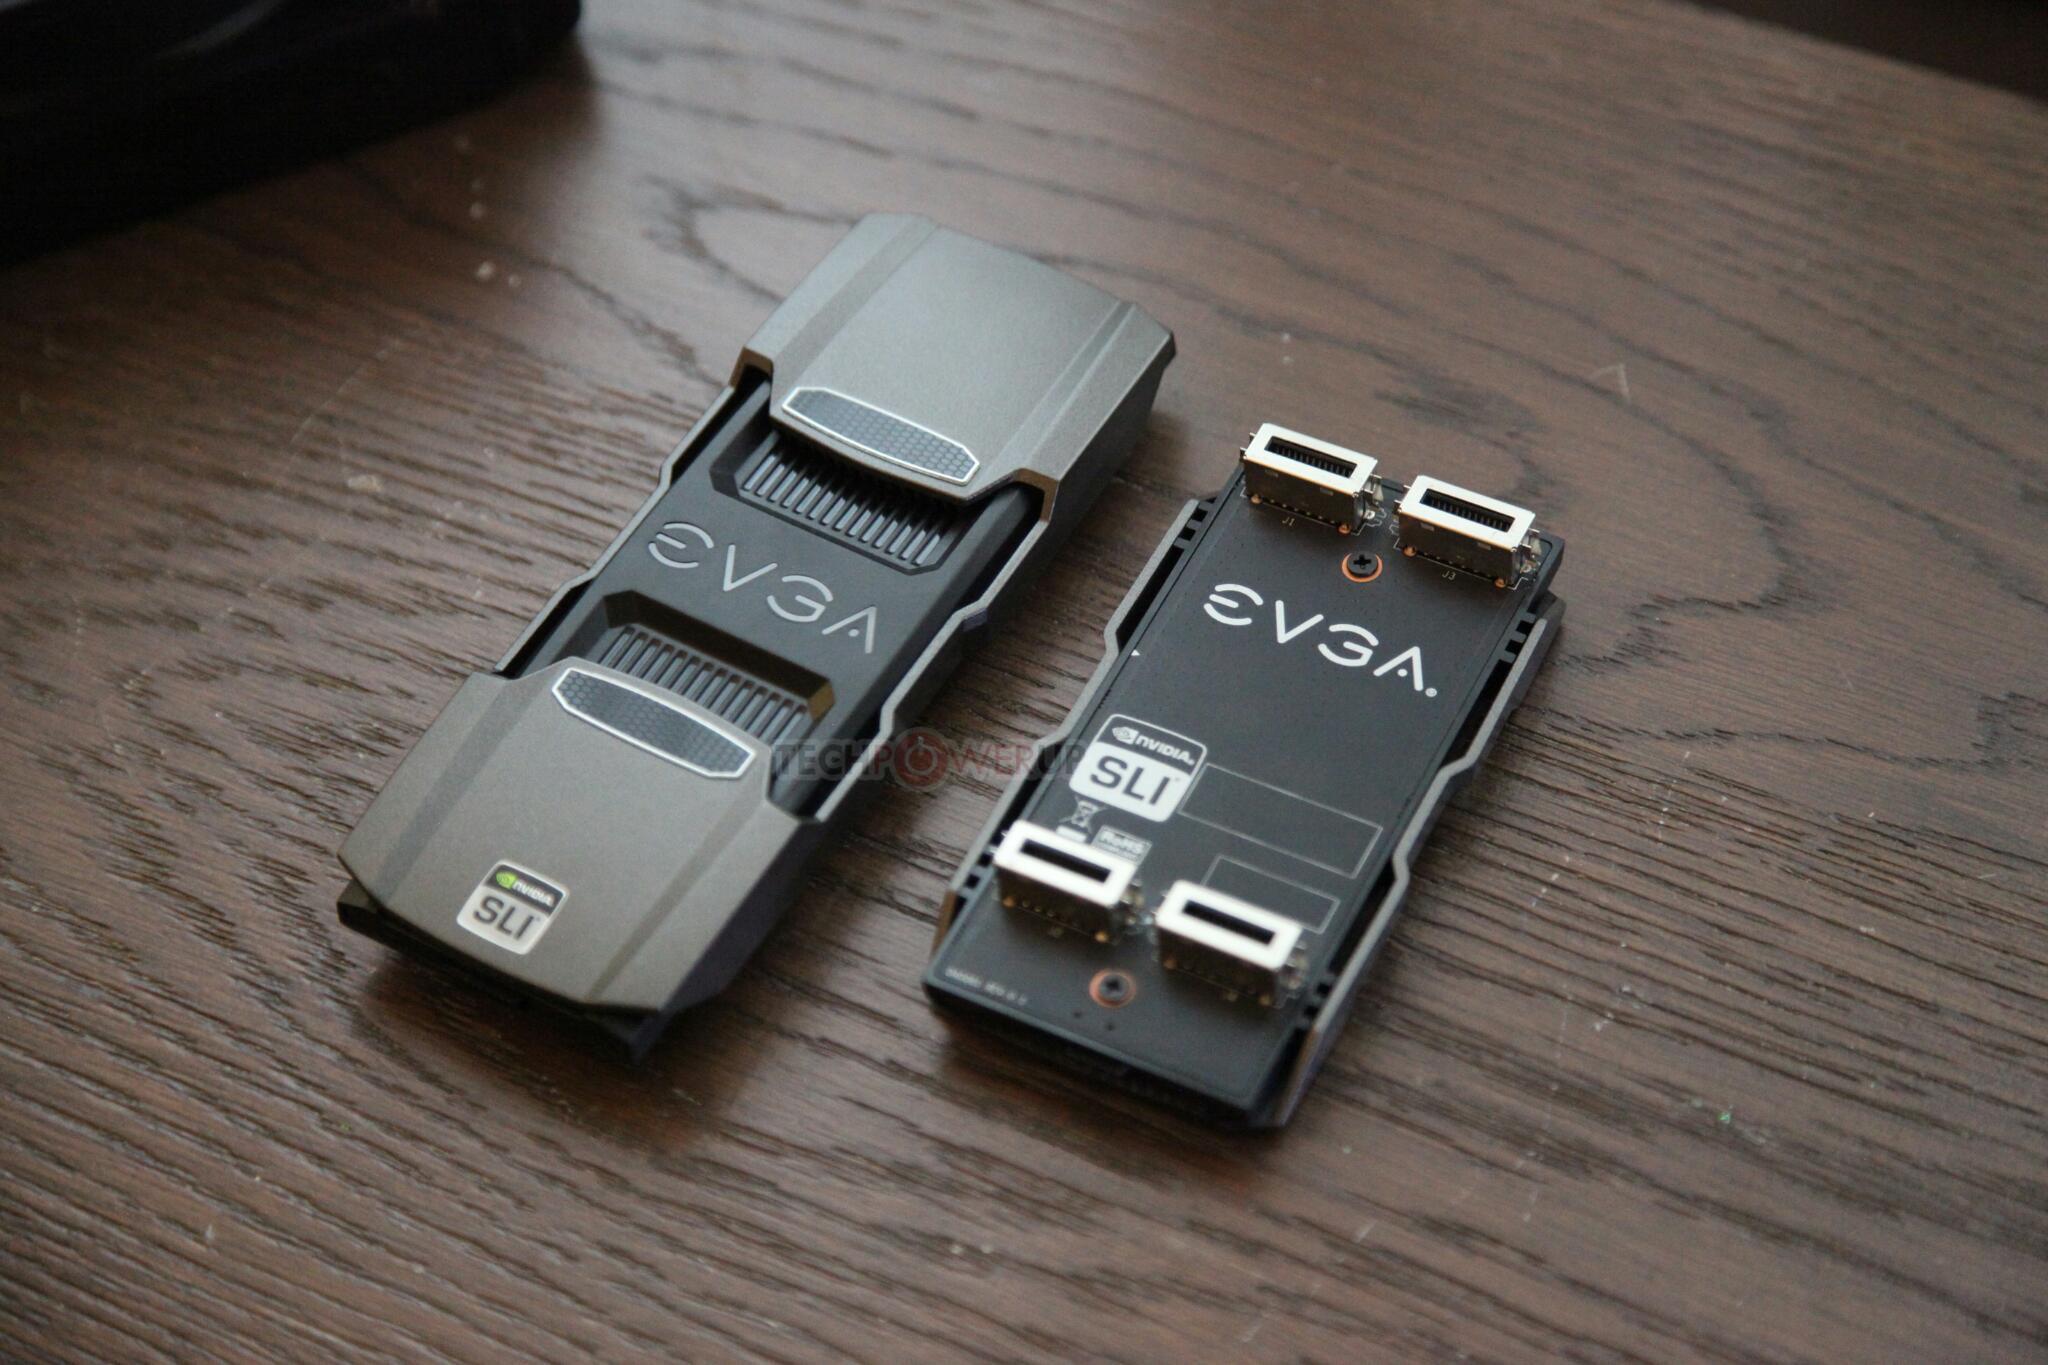 Nuevos puentes SLI de alto rendimiento EVGA SLI HB